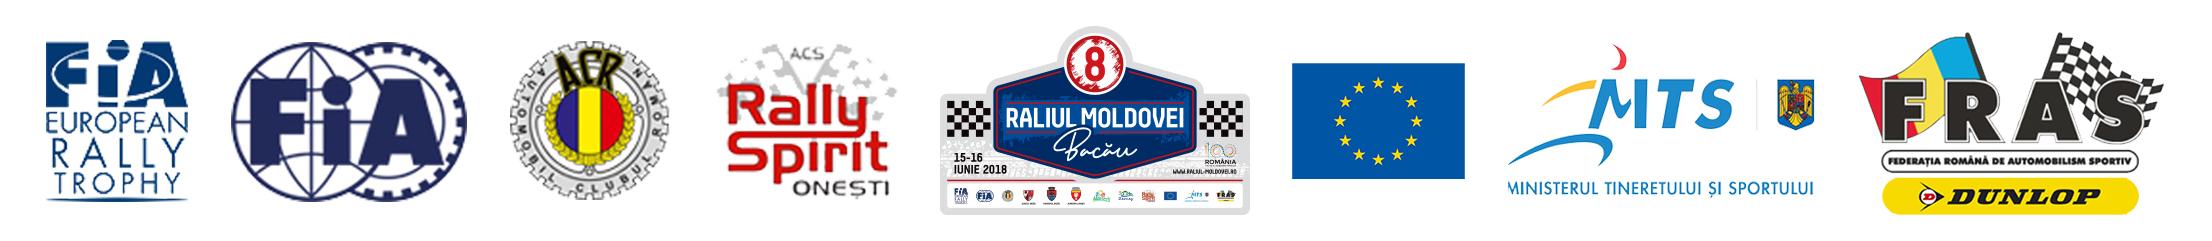 header documente raliul moldovei